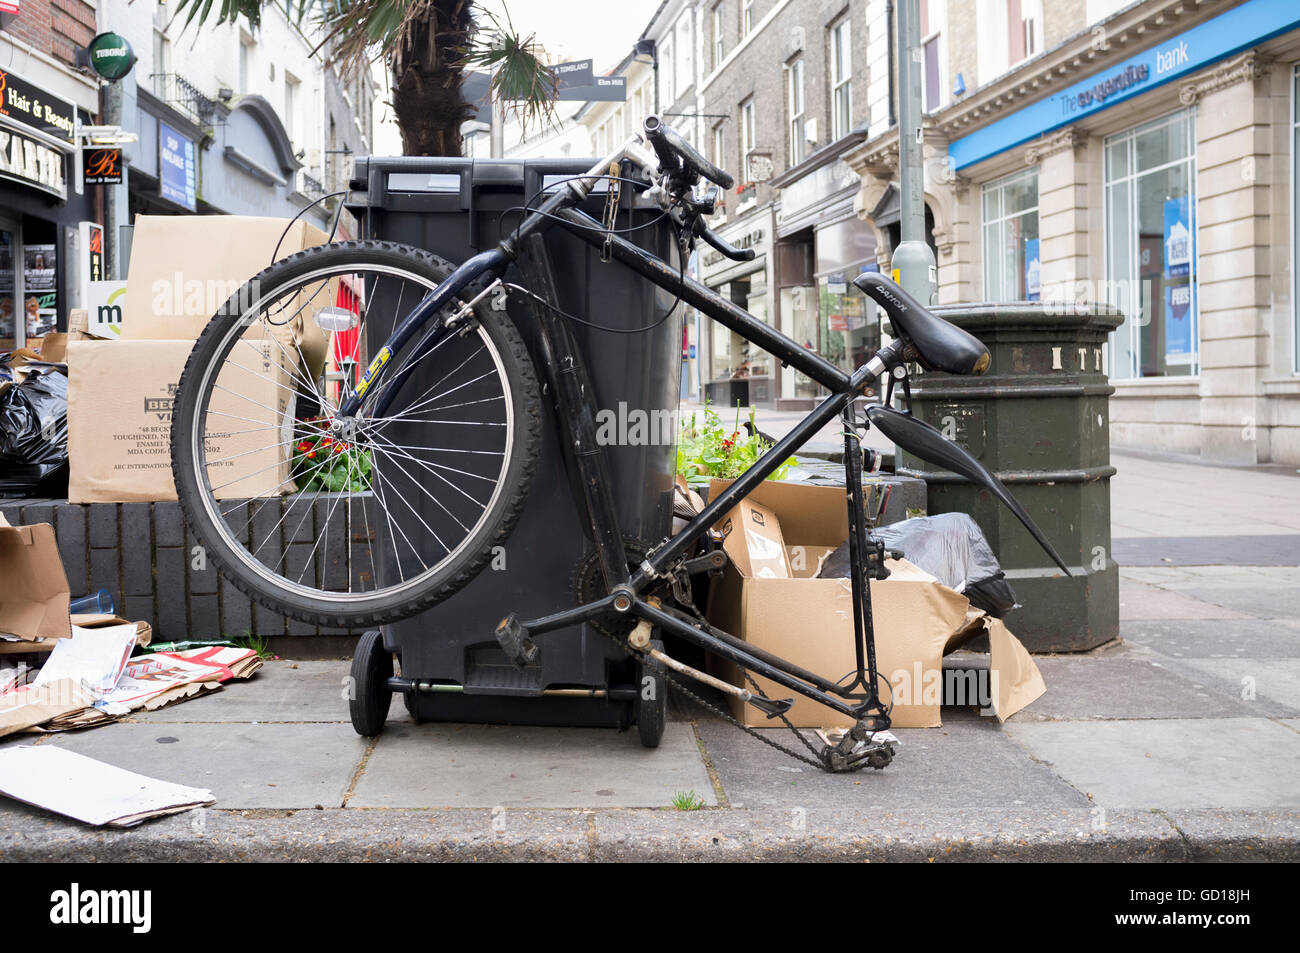 Mountain bike dumped by rubbish bin - Stock Image